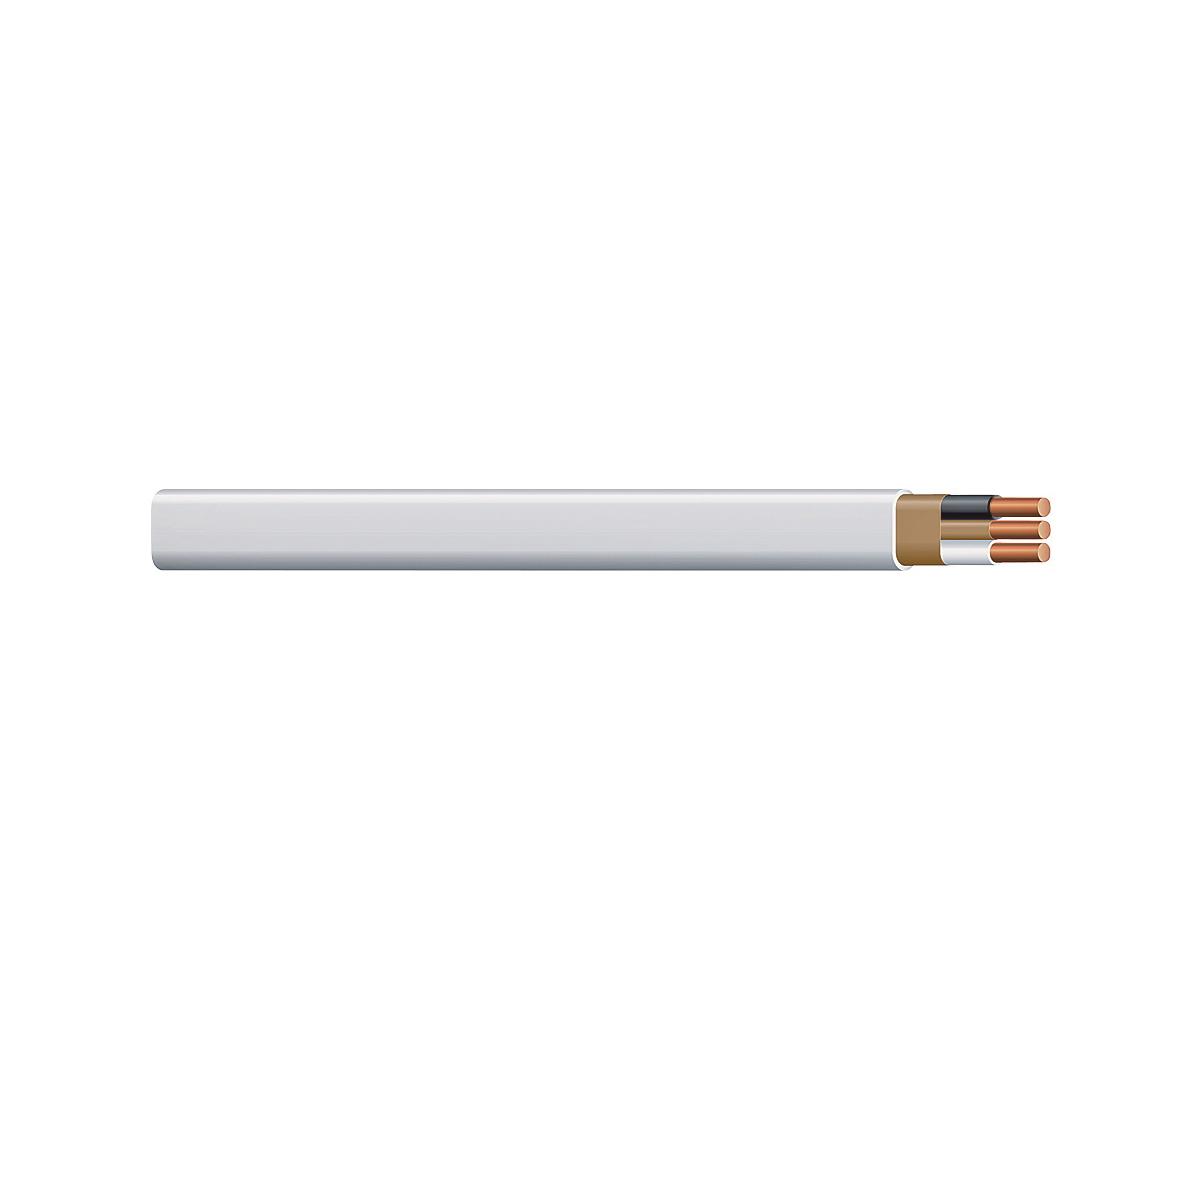 Picture of Romex 1051093 Building Wire, 14 AWG Wire, 2-Conductor, Copper Conductor, PVC Insulation, Nylon Sheath, 250 ft L